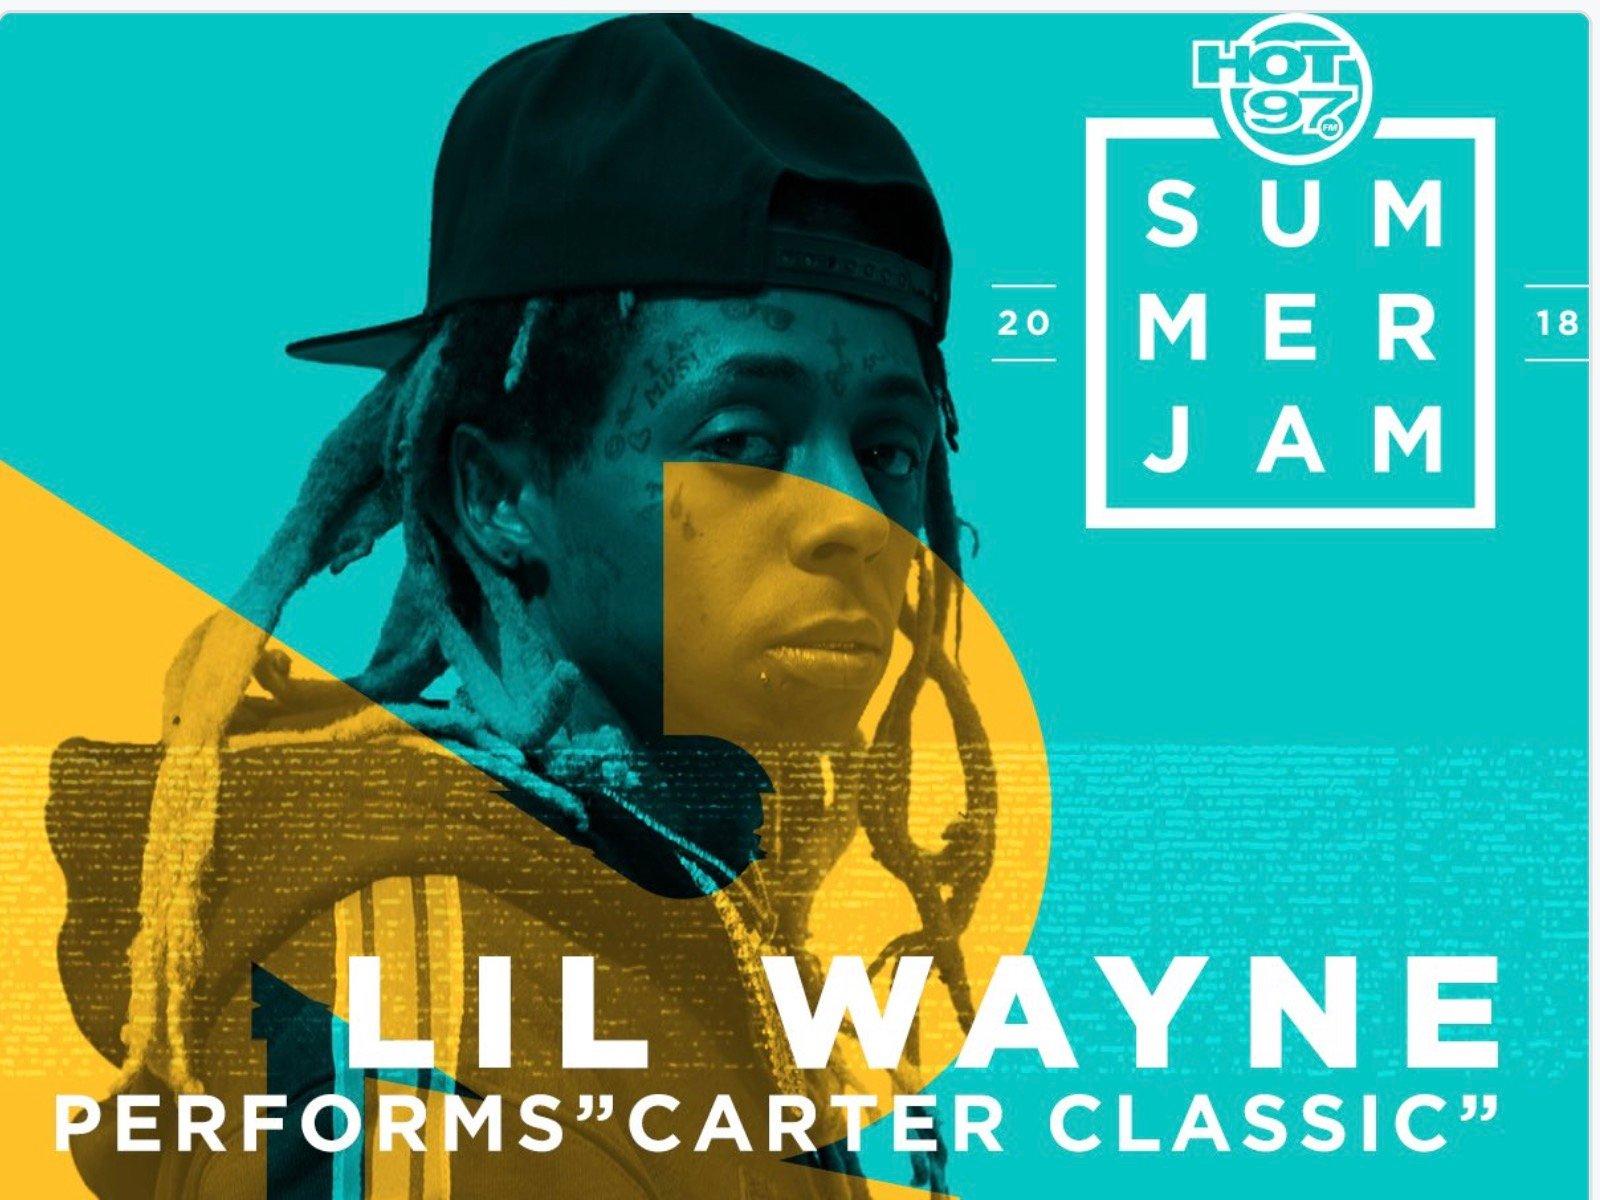 Hot 97 Lil Wayne Summer Jam